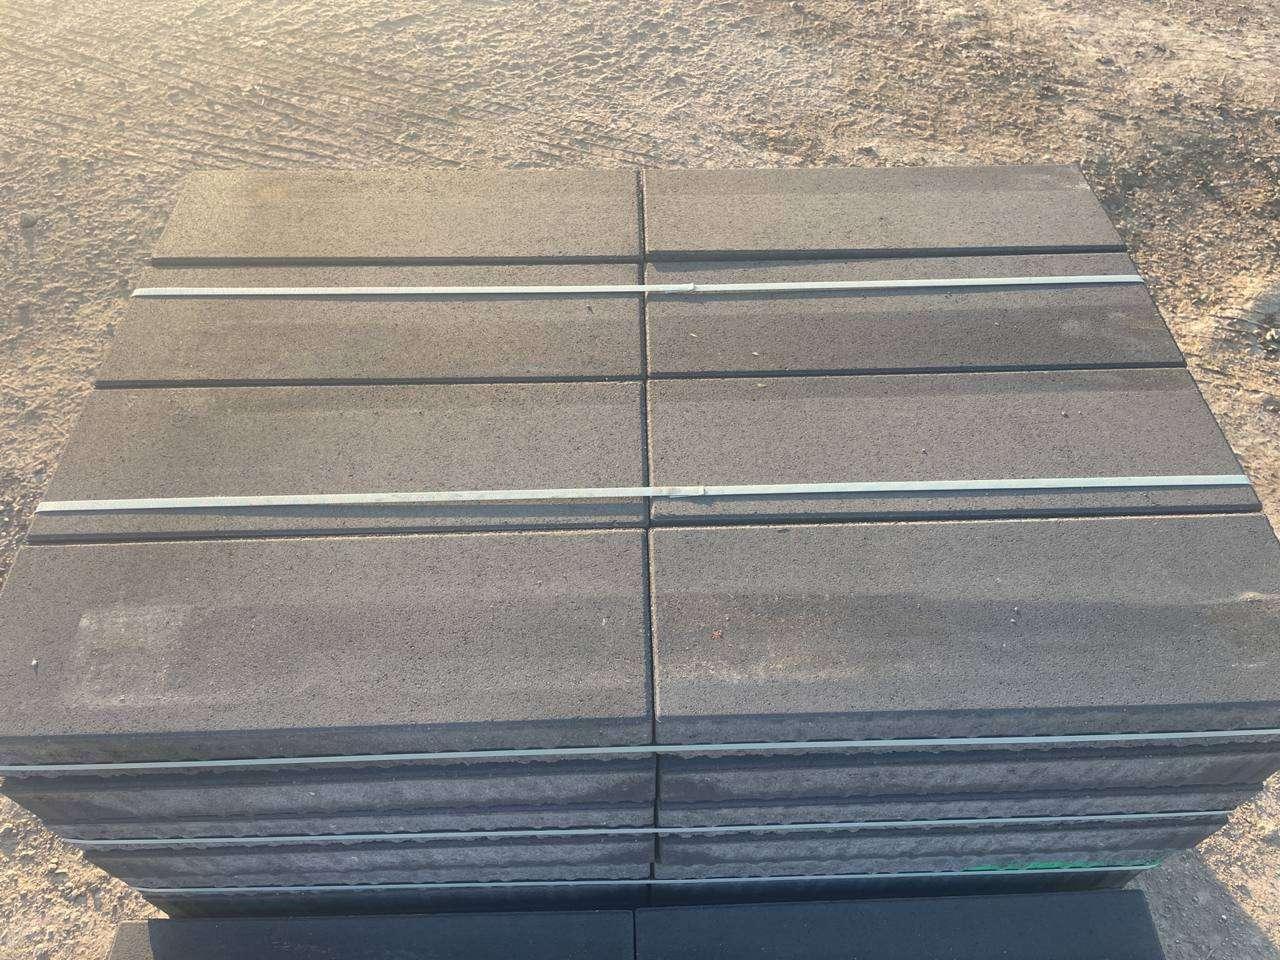 Prestige-Line Rechteckpflaster 60x20x8 cm anthrazit (2.Wahl)